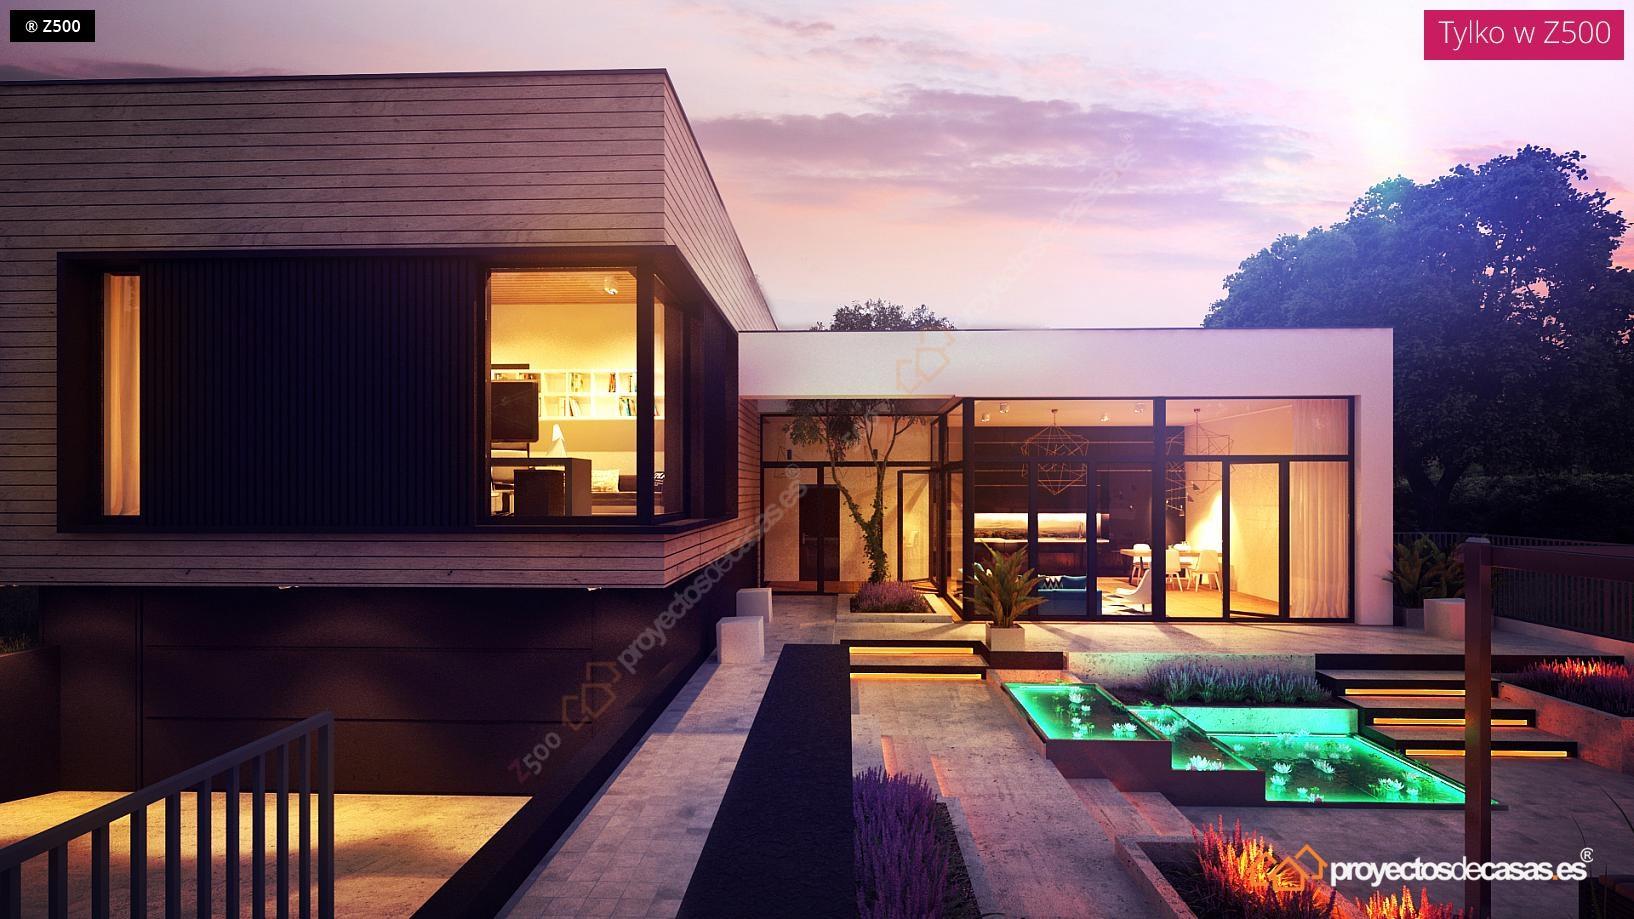 Proyectosdecasas dise amos y construimos casas en toda espa a - Fotos de casas en forma de l ...